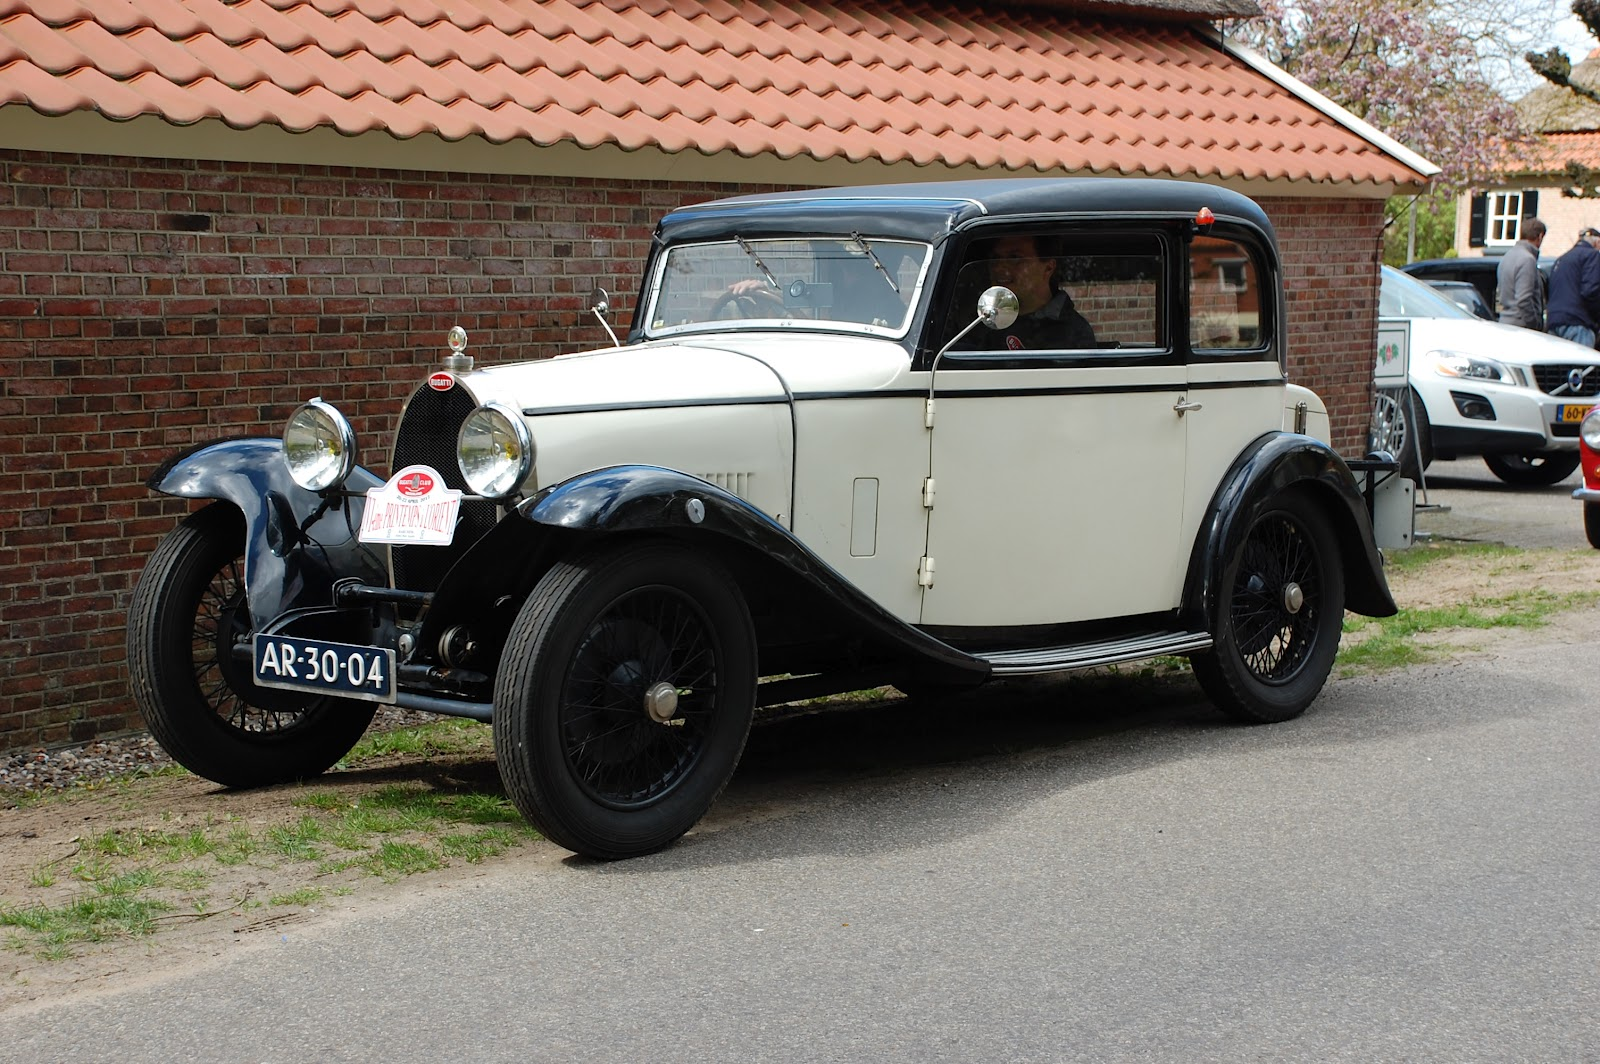 ... .blogspot Oldtimers en Meer : Bugatti's bij De Pot in Markelo (Video: janwib.blogspot.nl/2012/04/bugattis-bij-de-pot-in-markelo.html